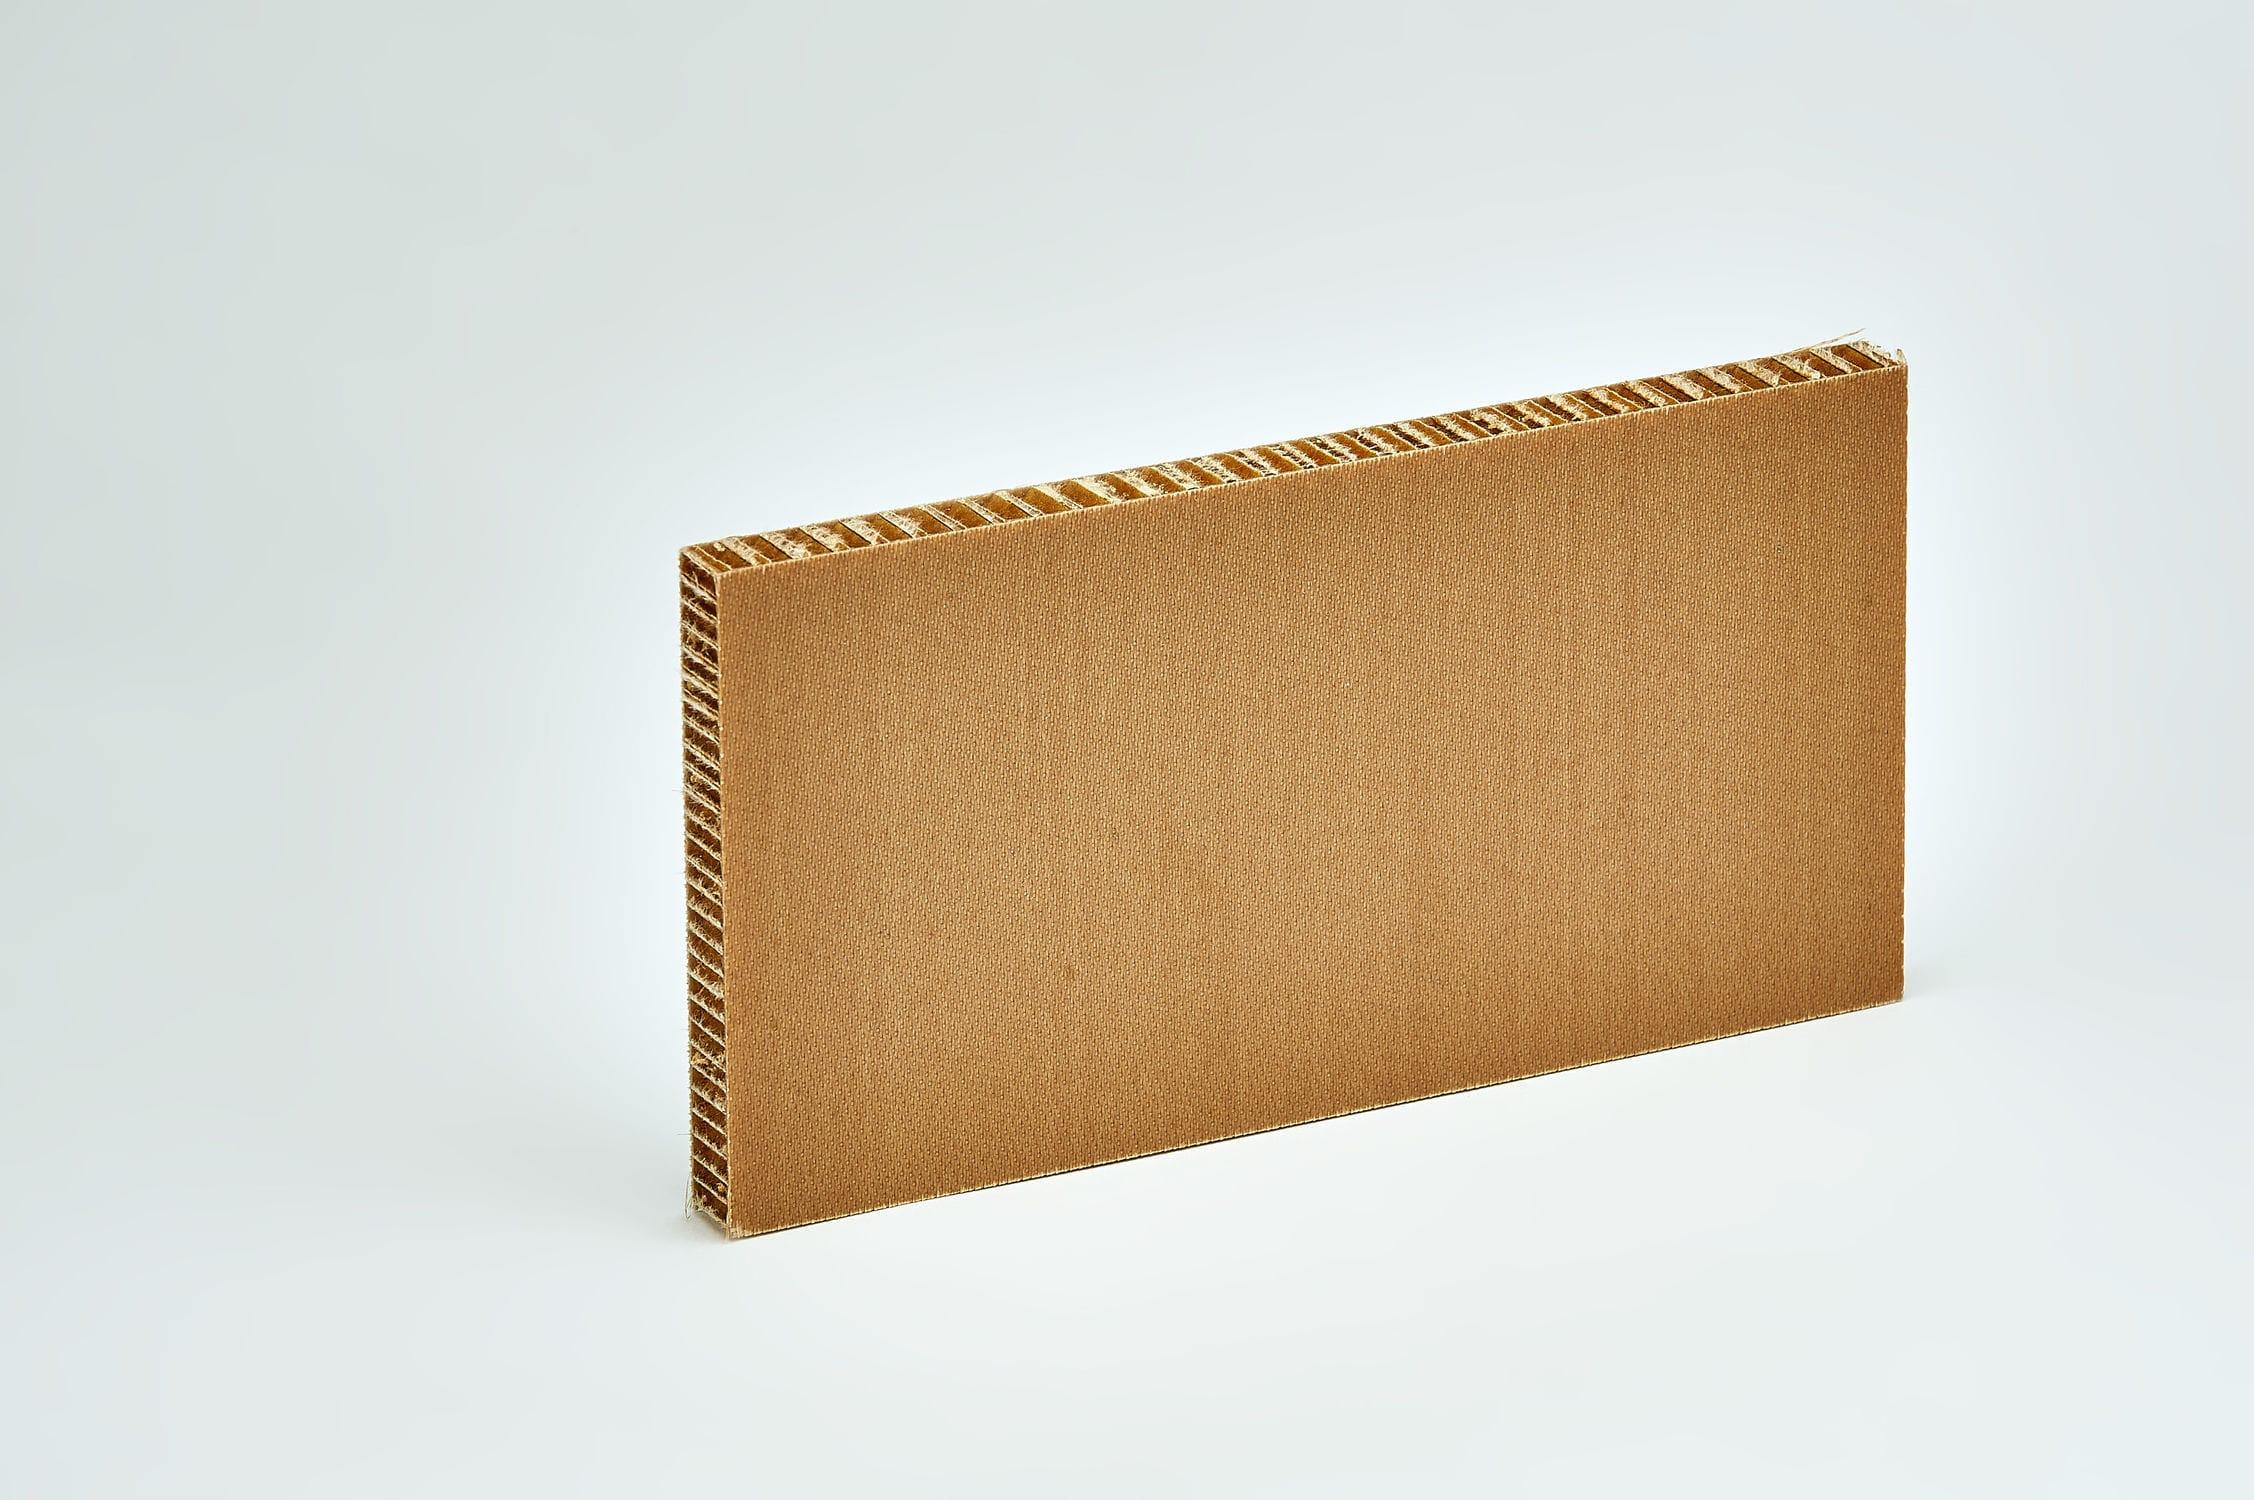 ... Seat sandwich panel / fiberglass facing / aramid paper honeycomb core / for doors ALUSTEP® ... & Seat sandwich panel / fiberglass facing / aramid paper honeycomb ... pezcame.com